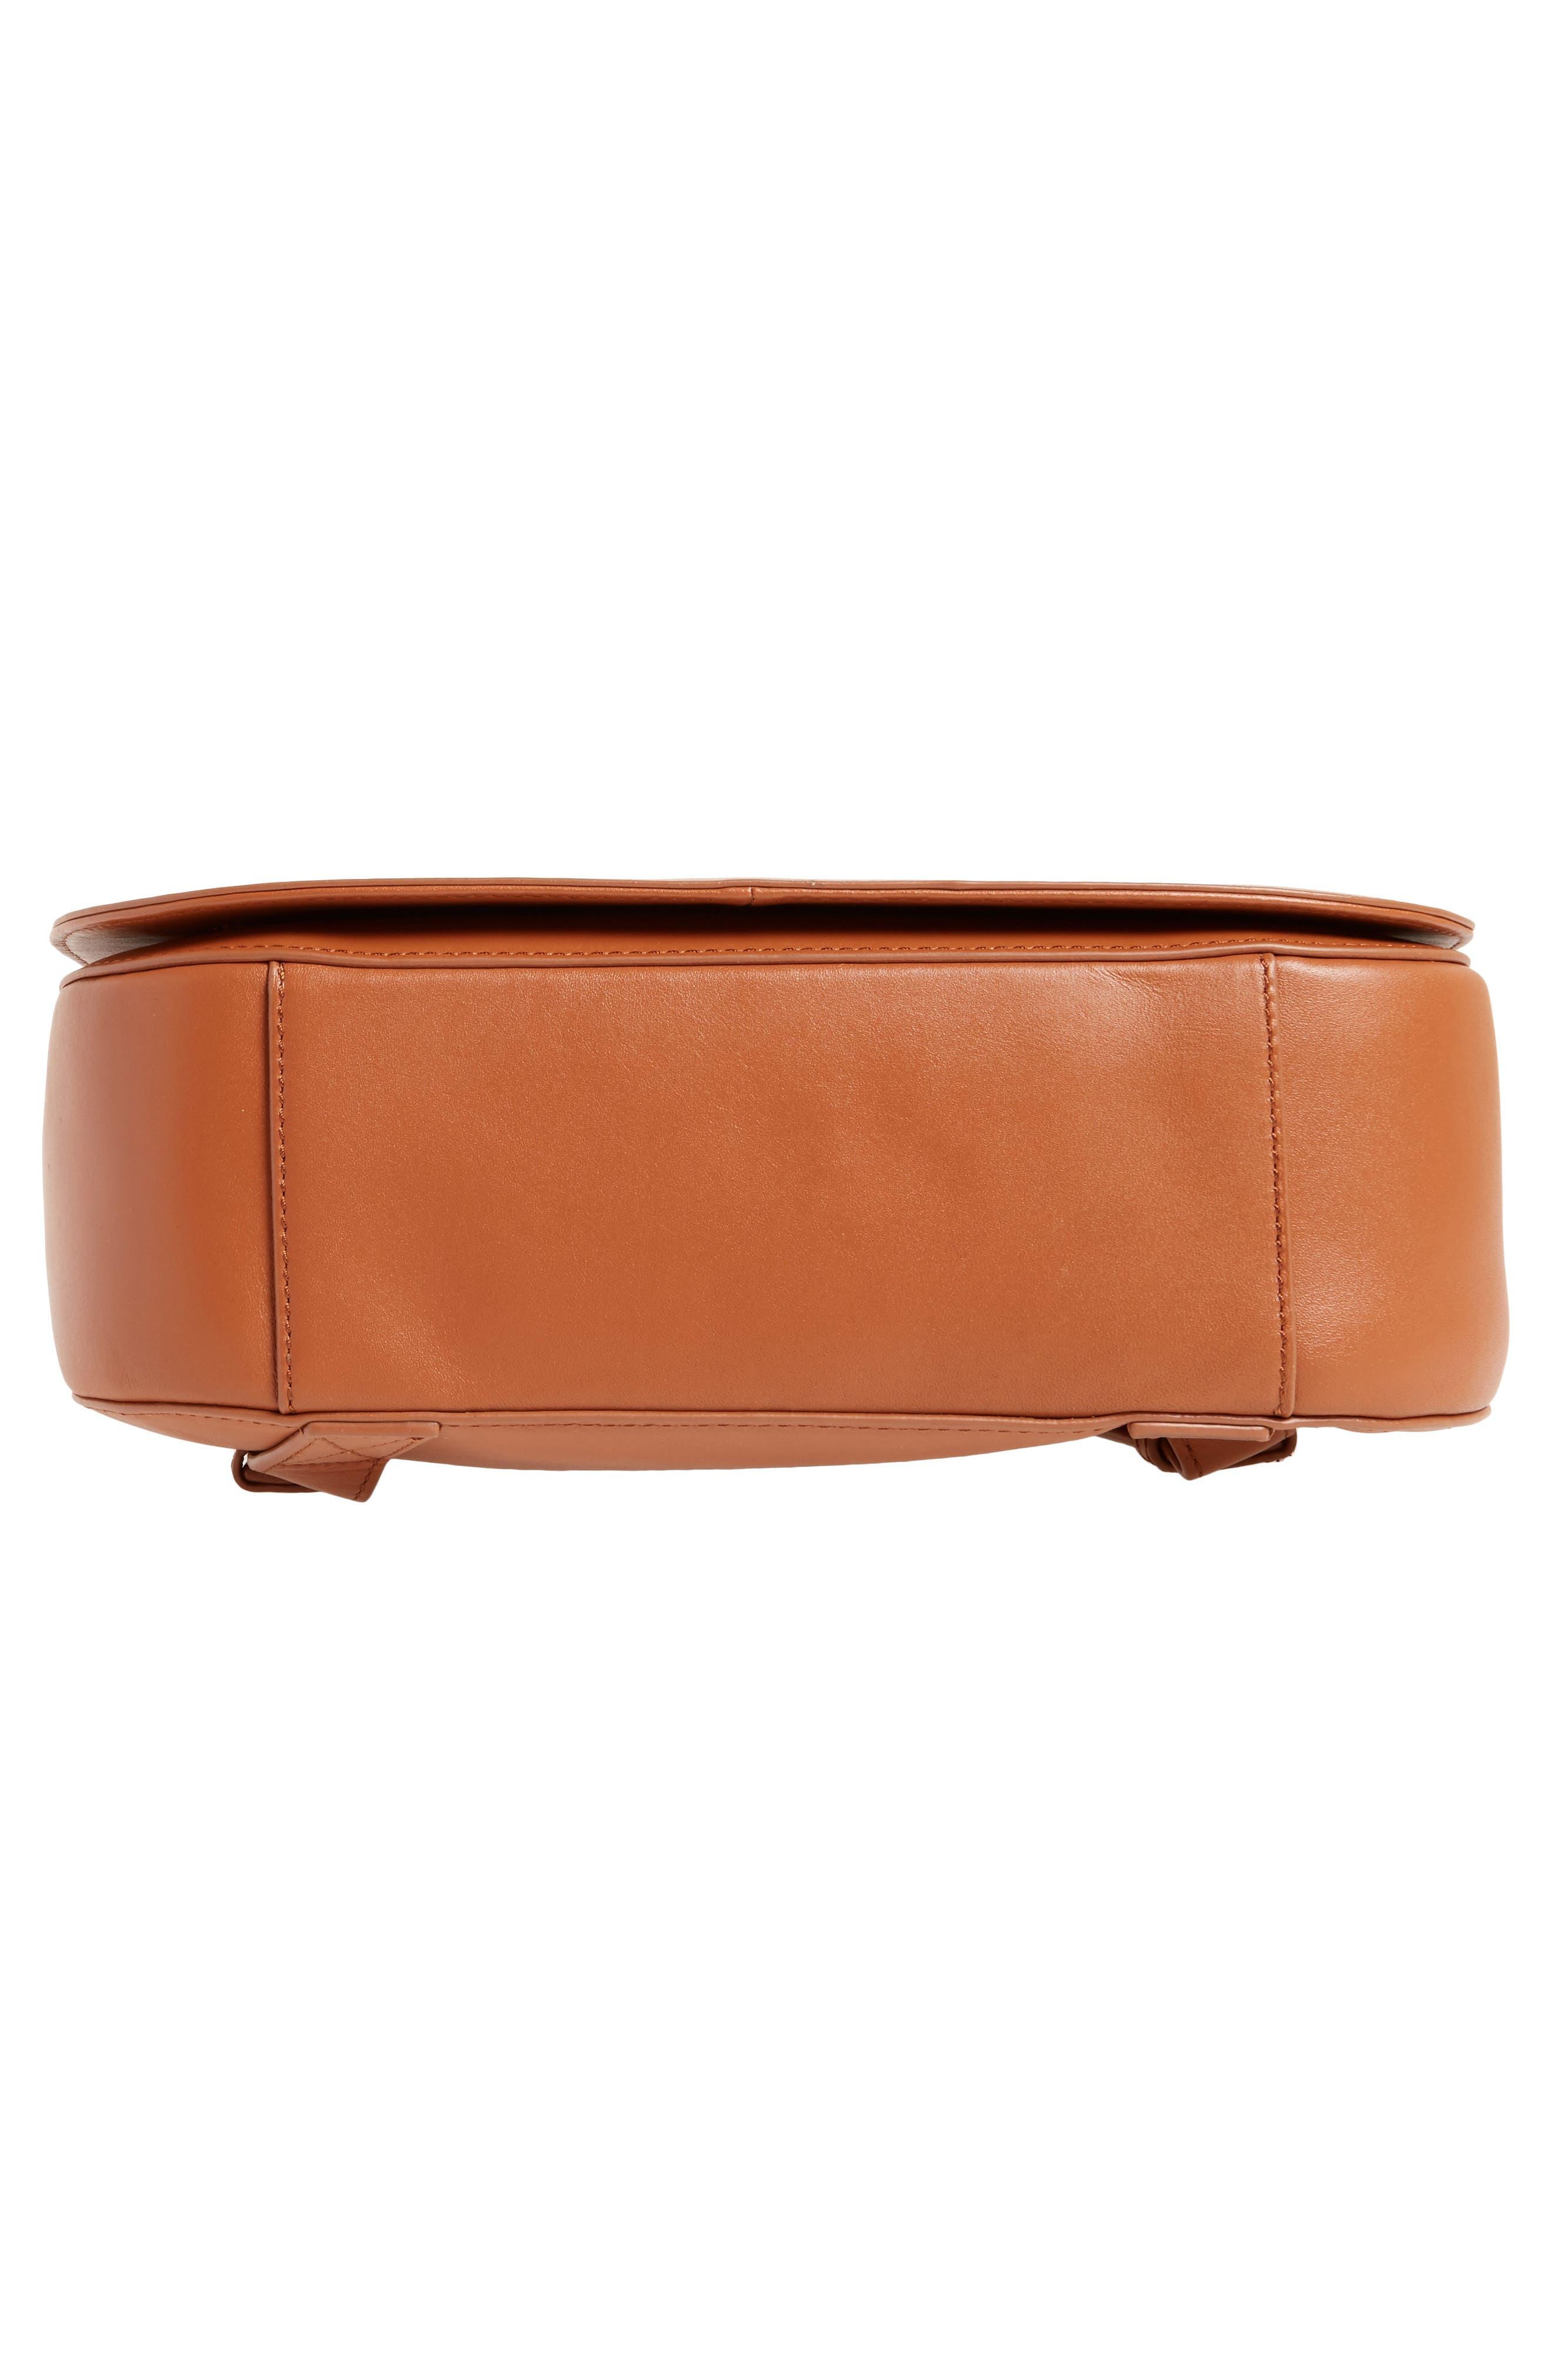 Kate Calfskin Leather Backpack,                             Alternate thumbnail 6, color,                             200